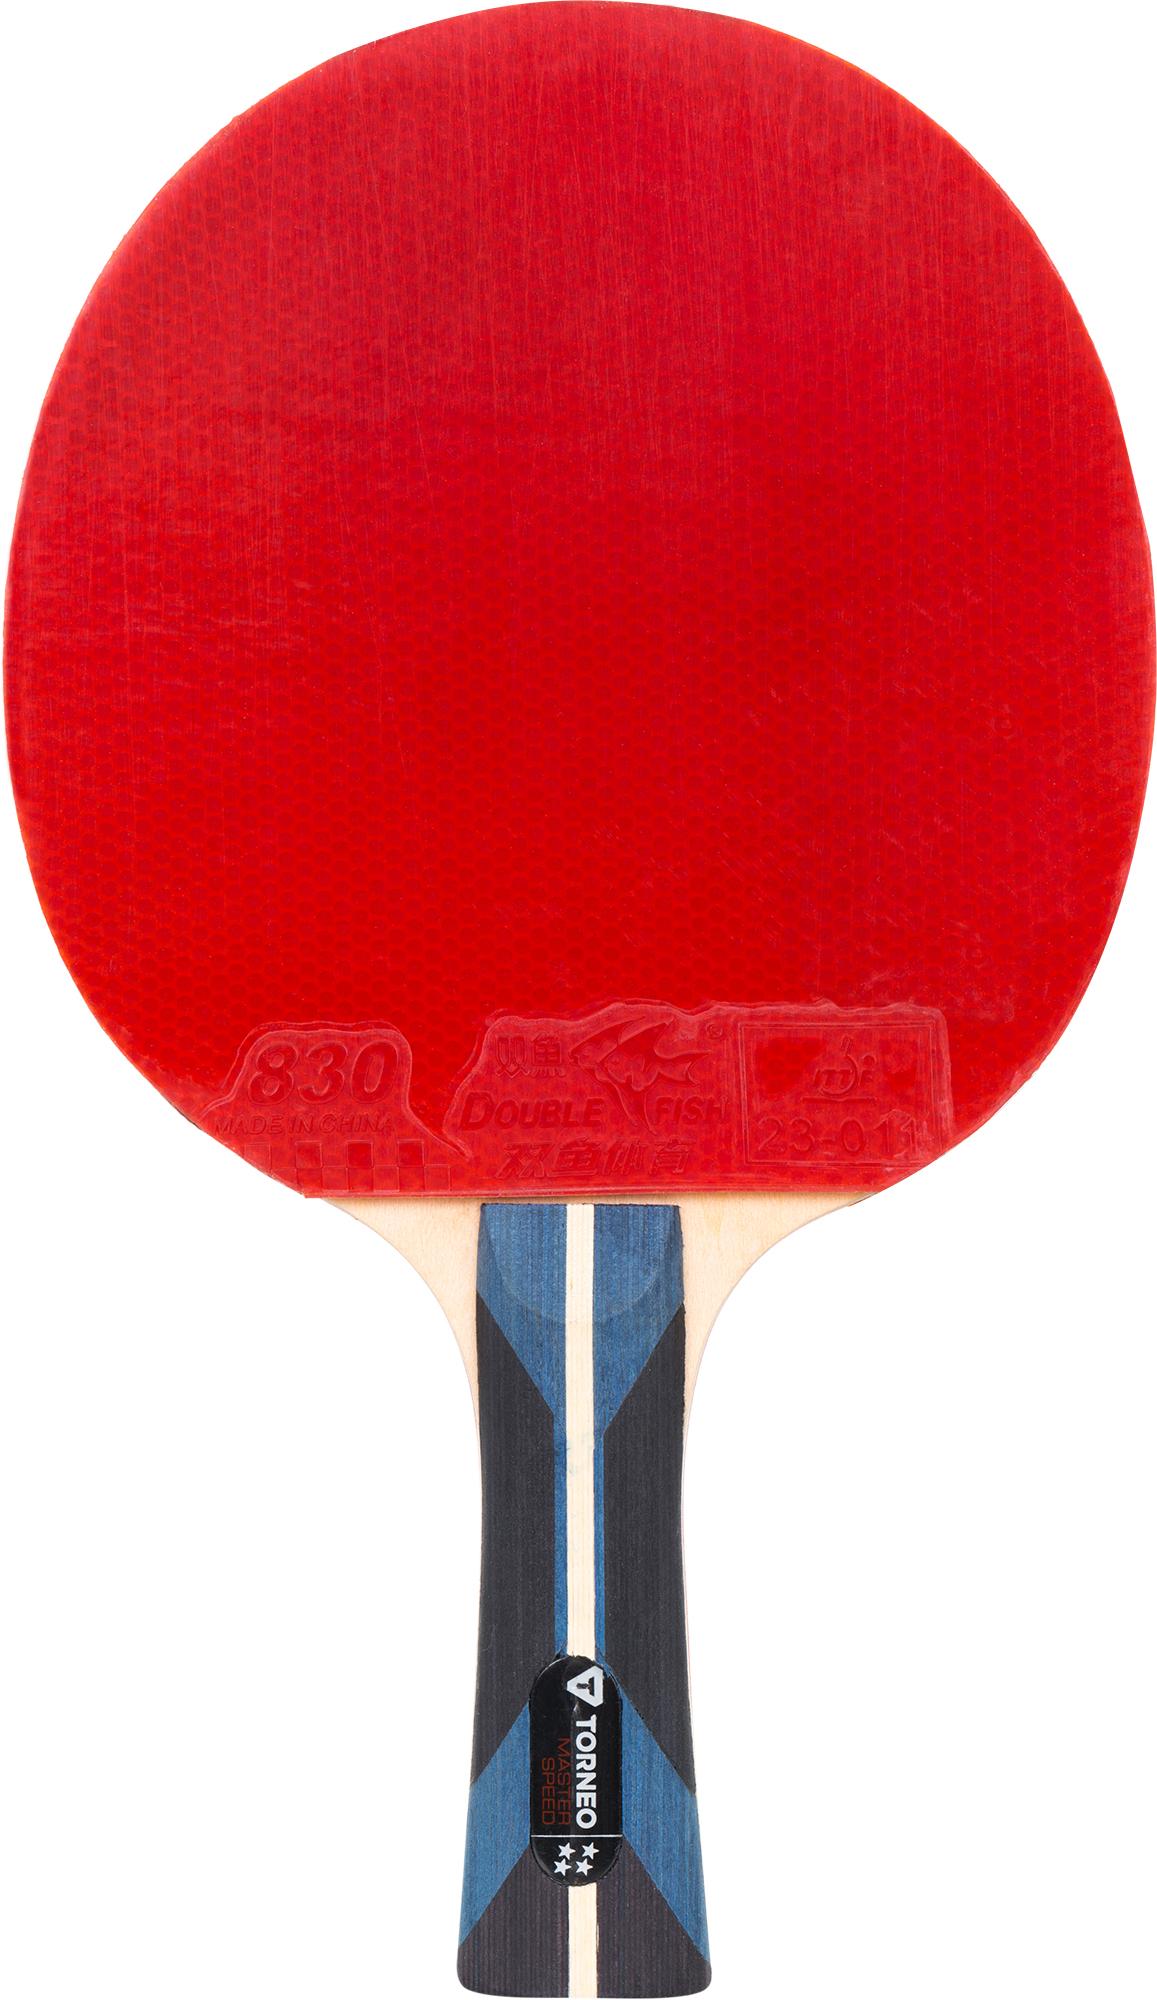 Torneo Ракетка для настольного тенниса Torneo Master Speed, размер Без размера цена 2017